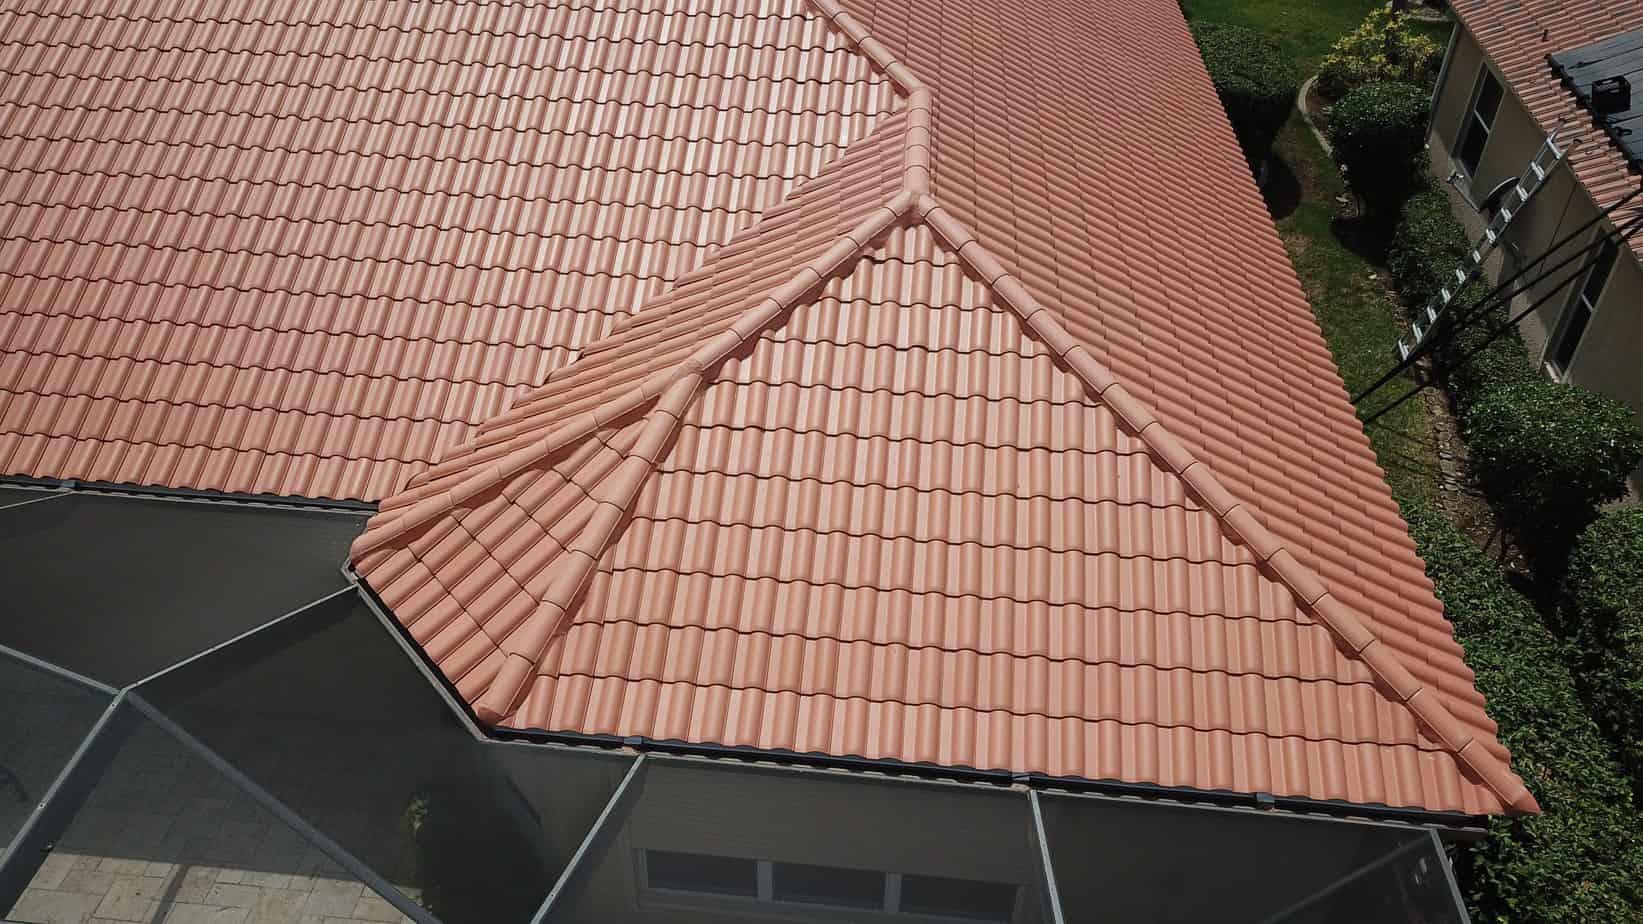 Roofing Contractor Naples Panama City Oakland Park Fl